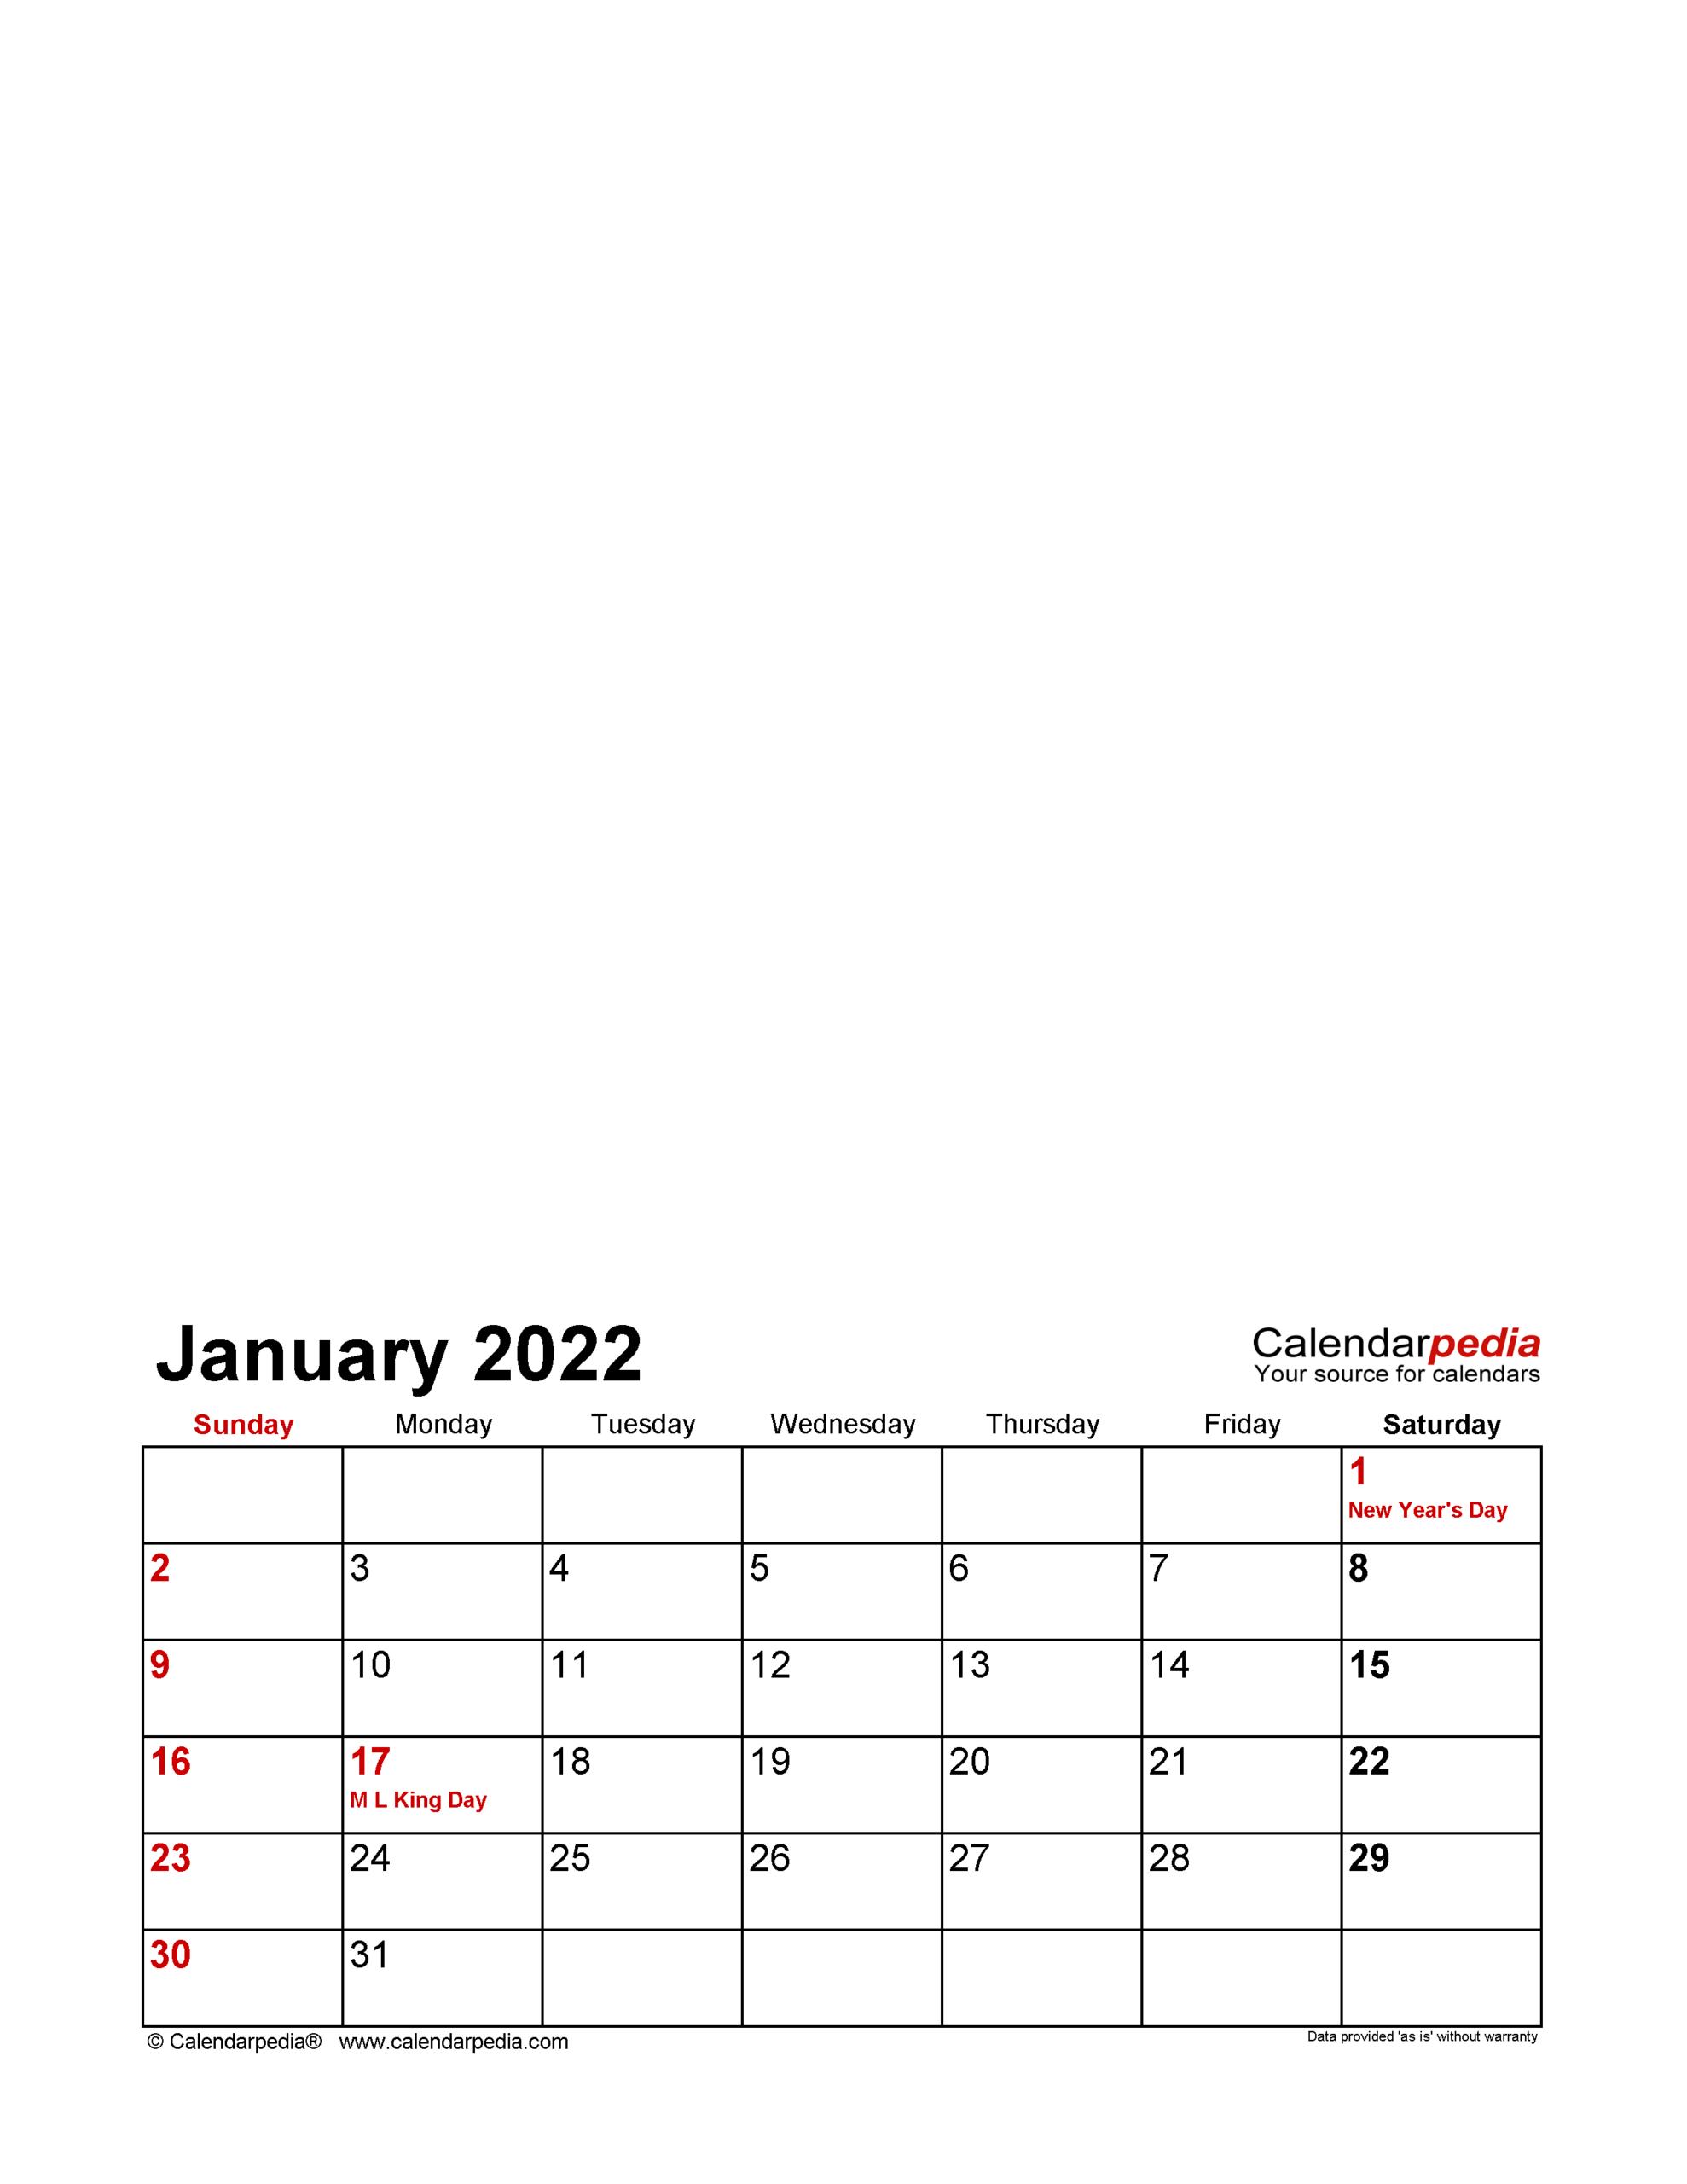 Photo Calendar 2022 - Free Printable Pdf Templates